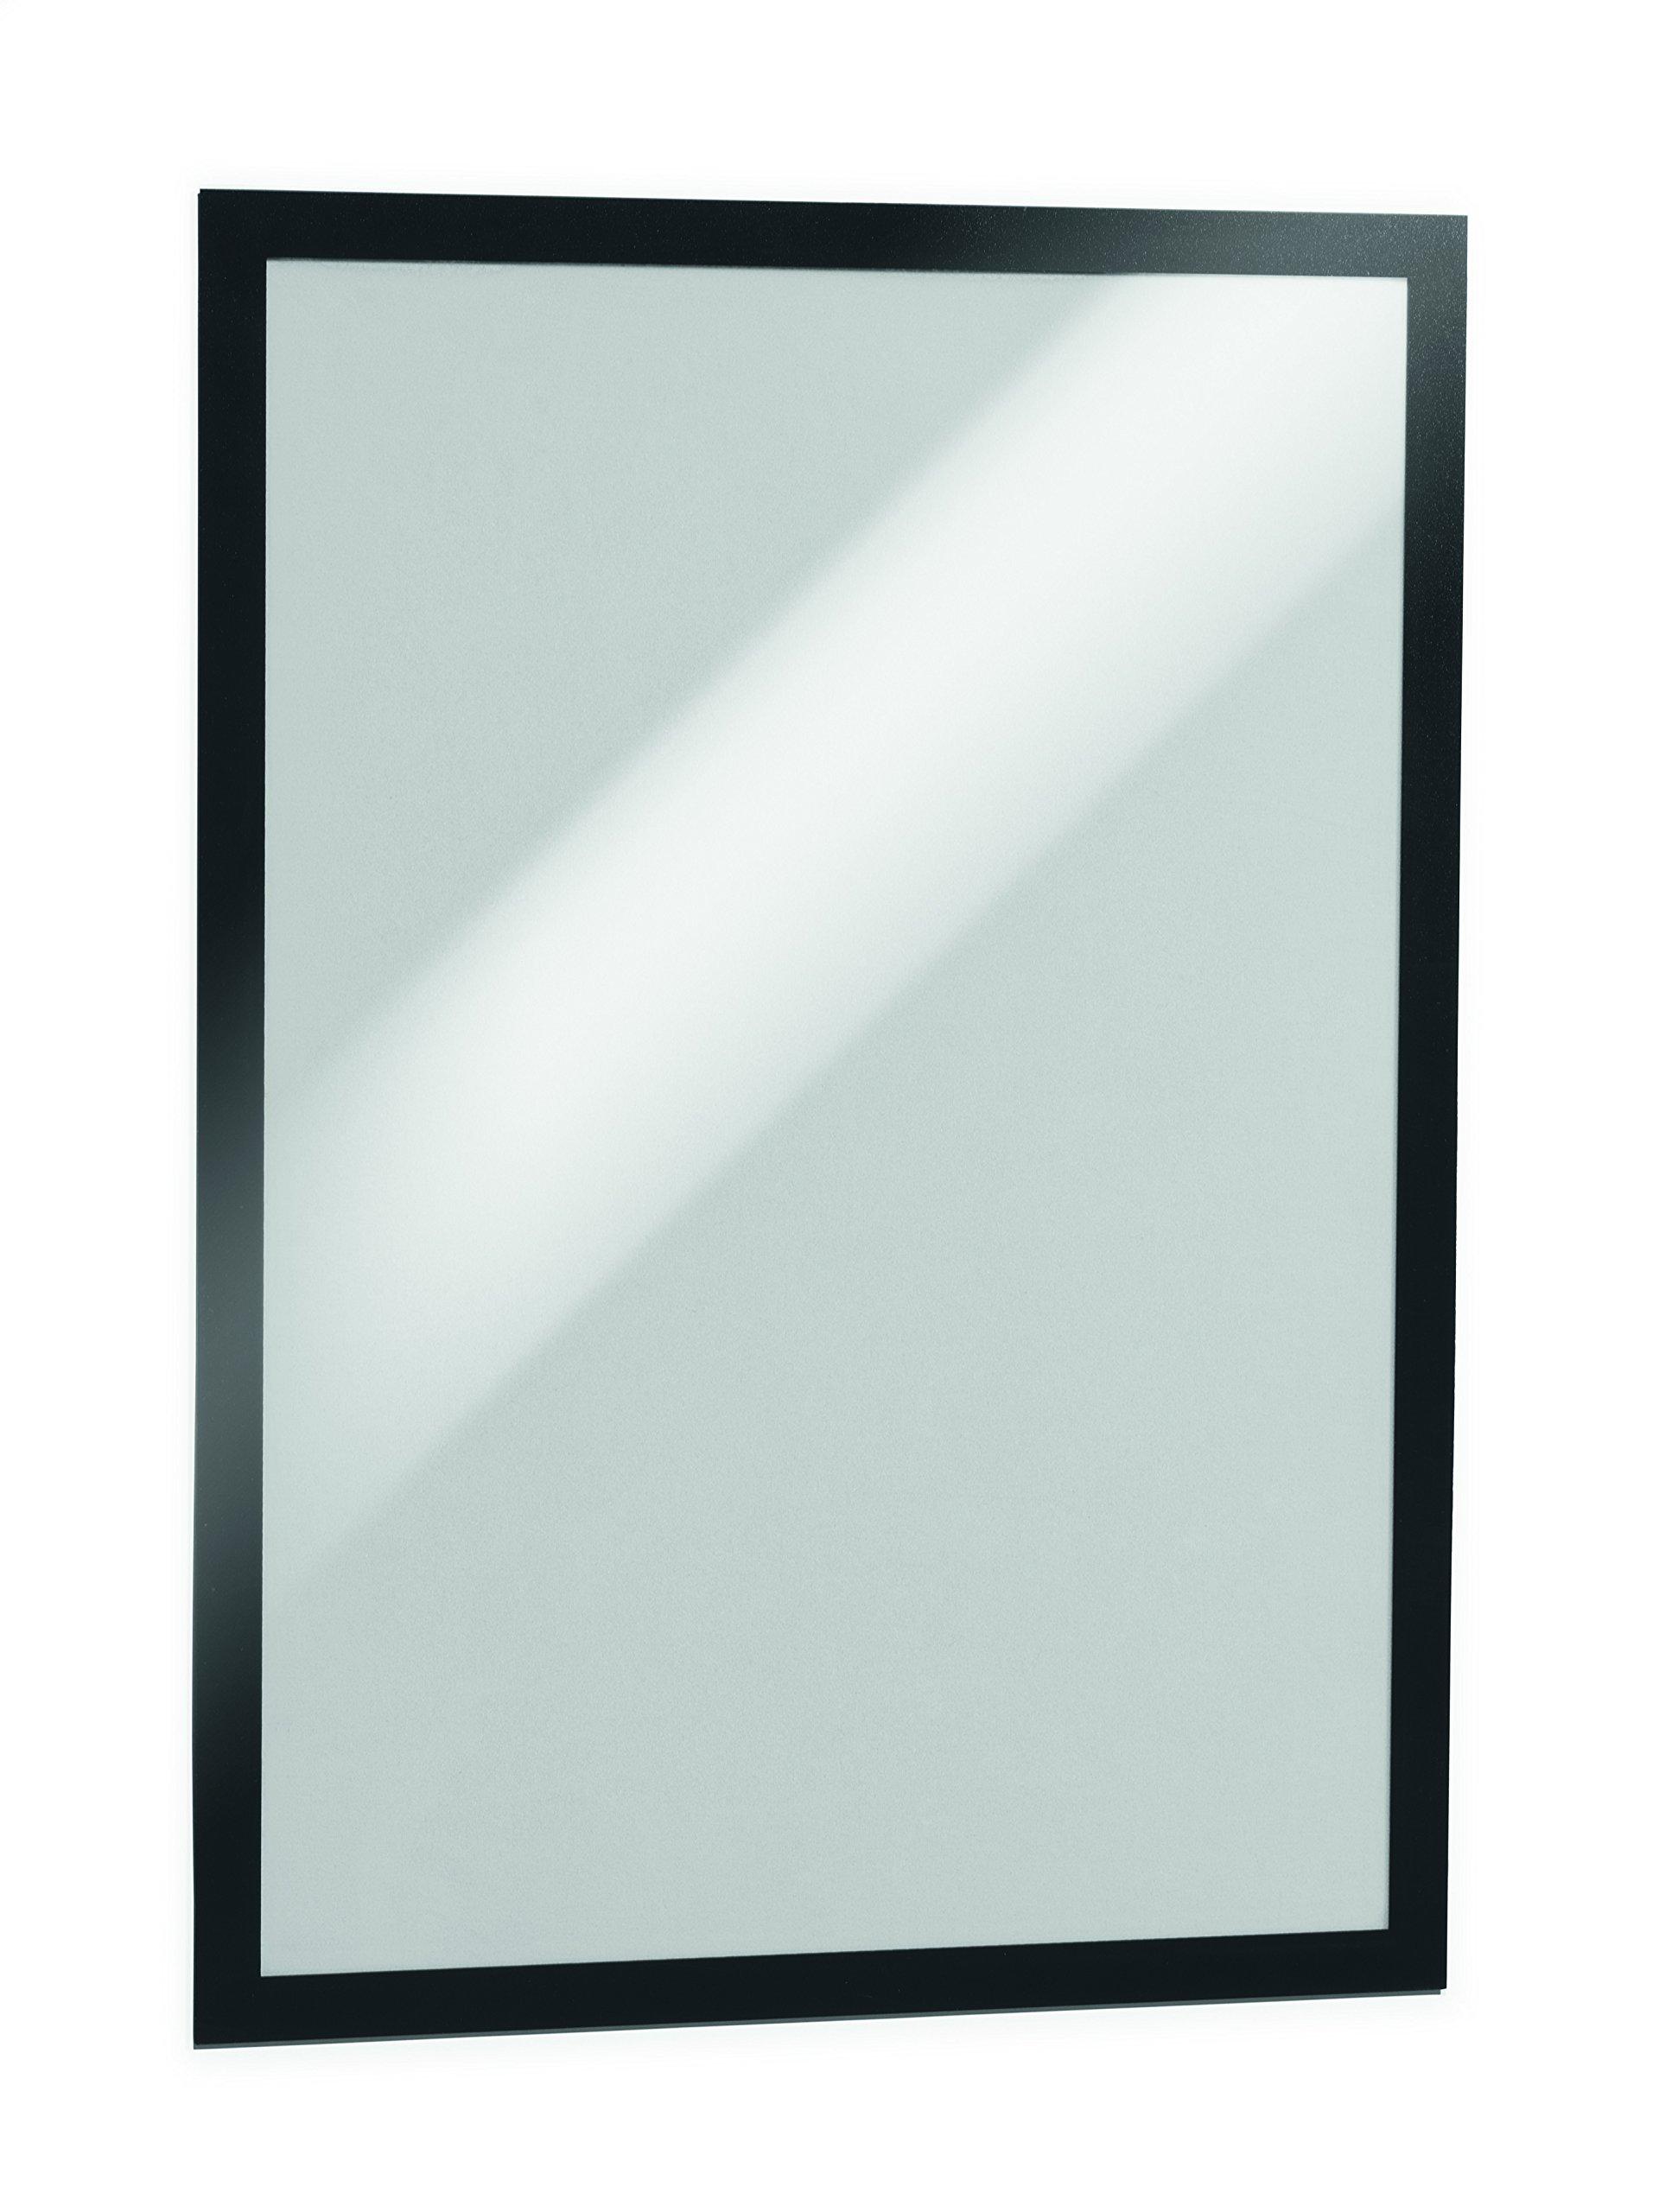 DURABLE DURAFRAME Tabloid, Self-Adhesive Magnetic Frame, 11'' X 17'', Black, 2-pack (476901)